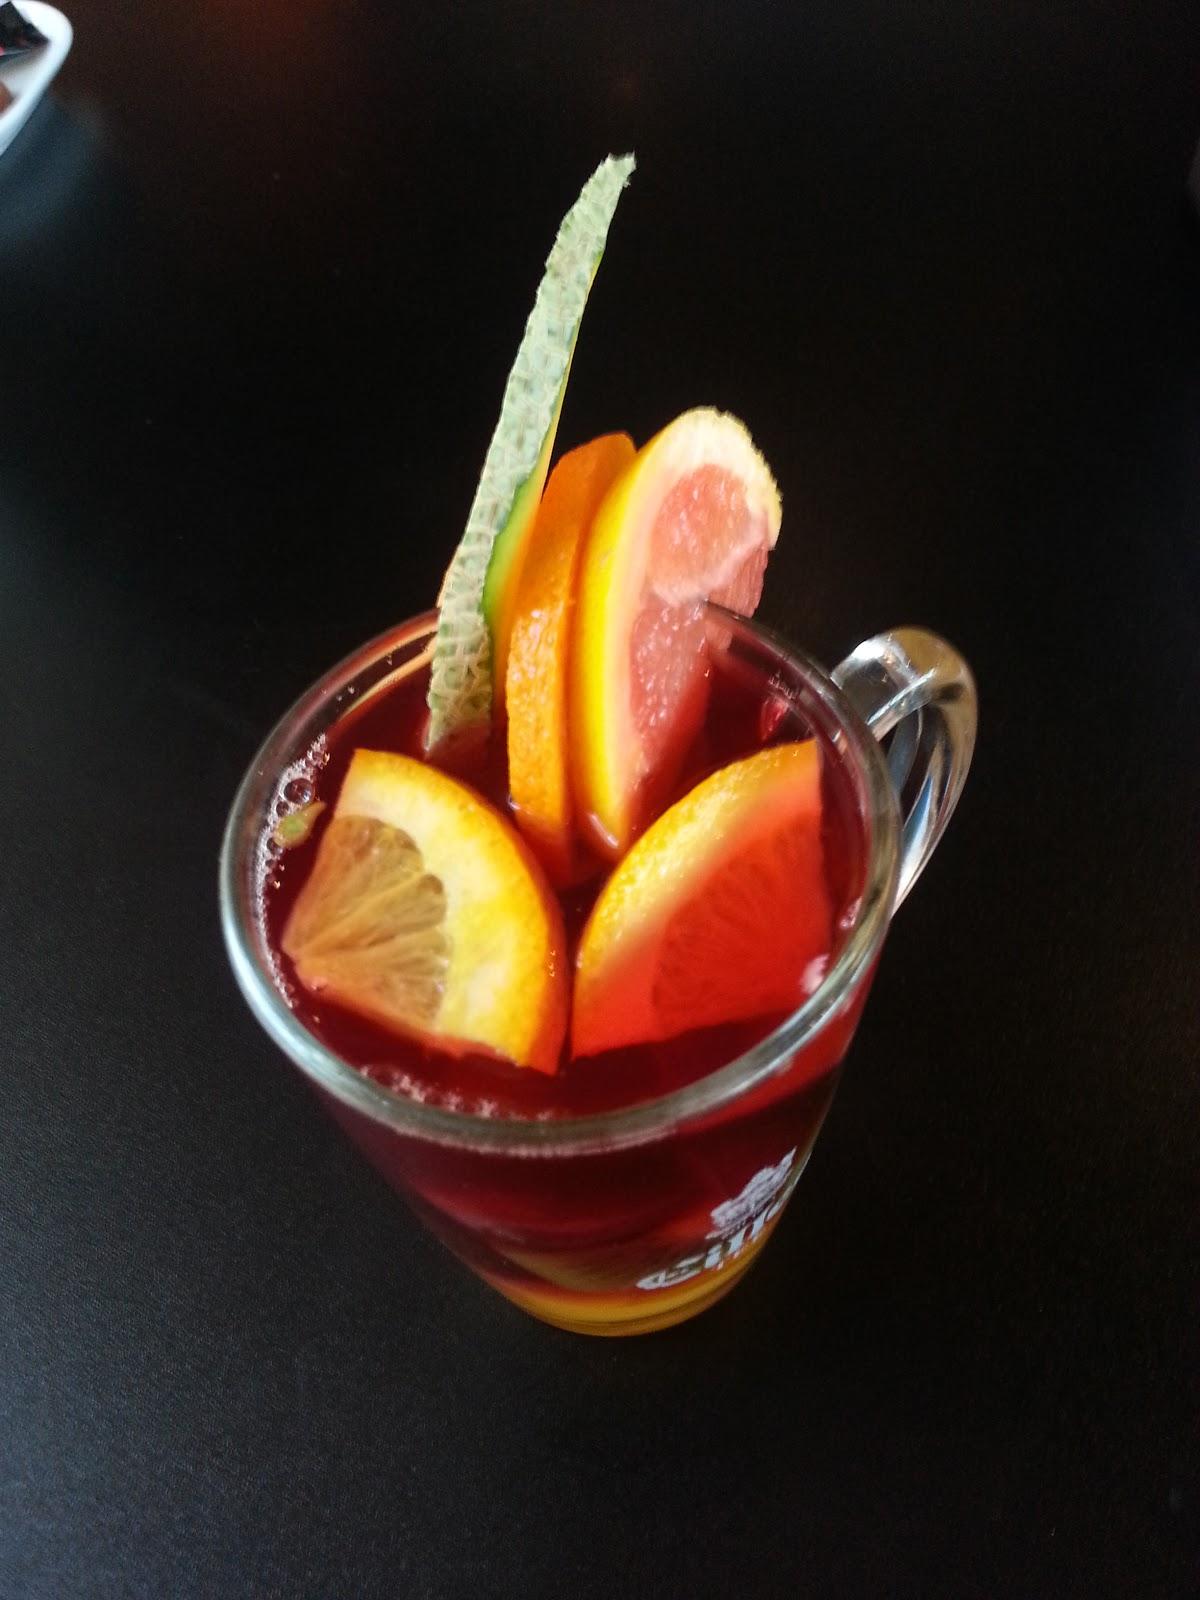 Max Ice & coffee, fruit tea, vegan